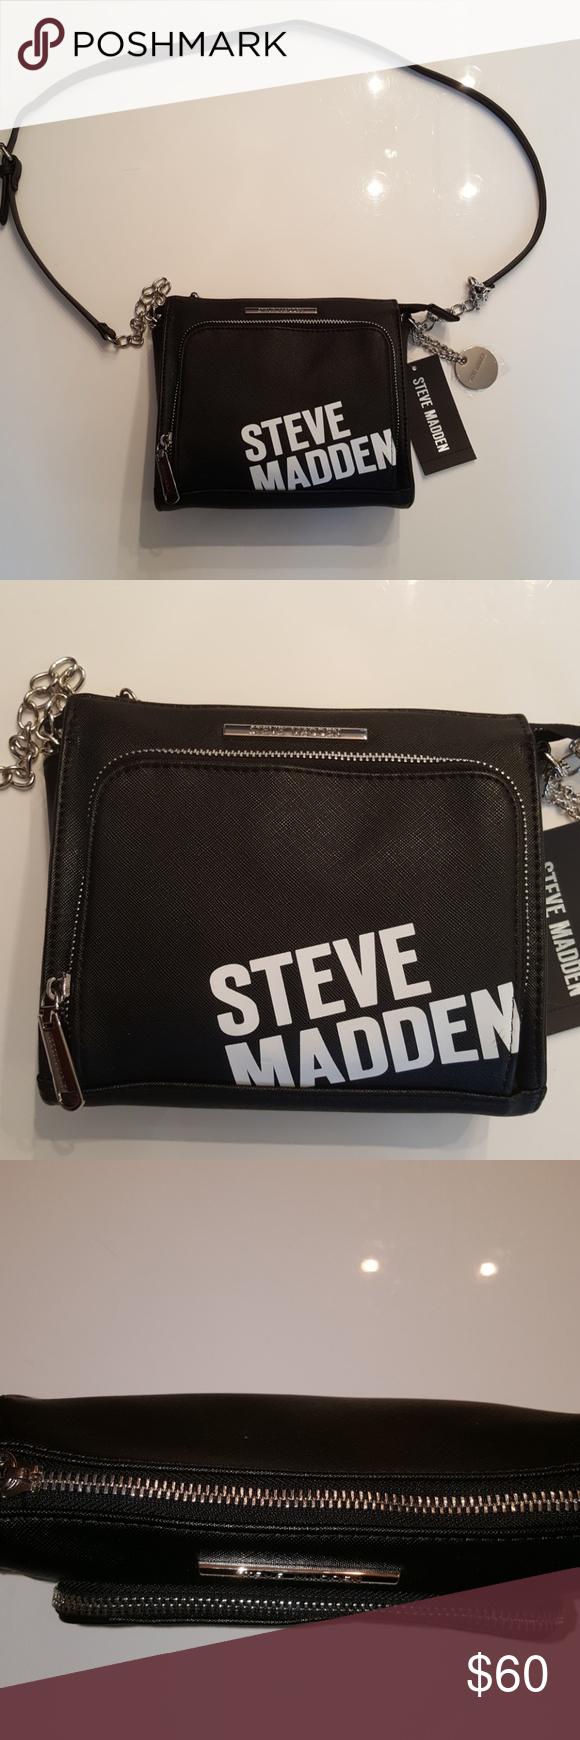 Steve Madden Black Bgrange Logo Crossbody Purse Steve Madden Black Bgrange Logo Crossbody Purse Black Faux Leather Purses Crossbody Steve Madden Crossbody